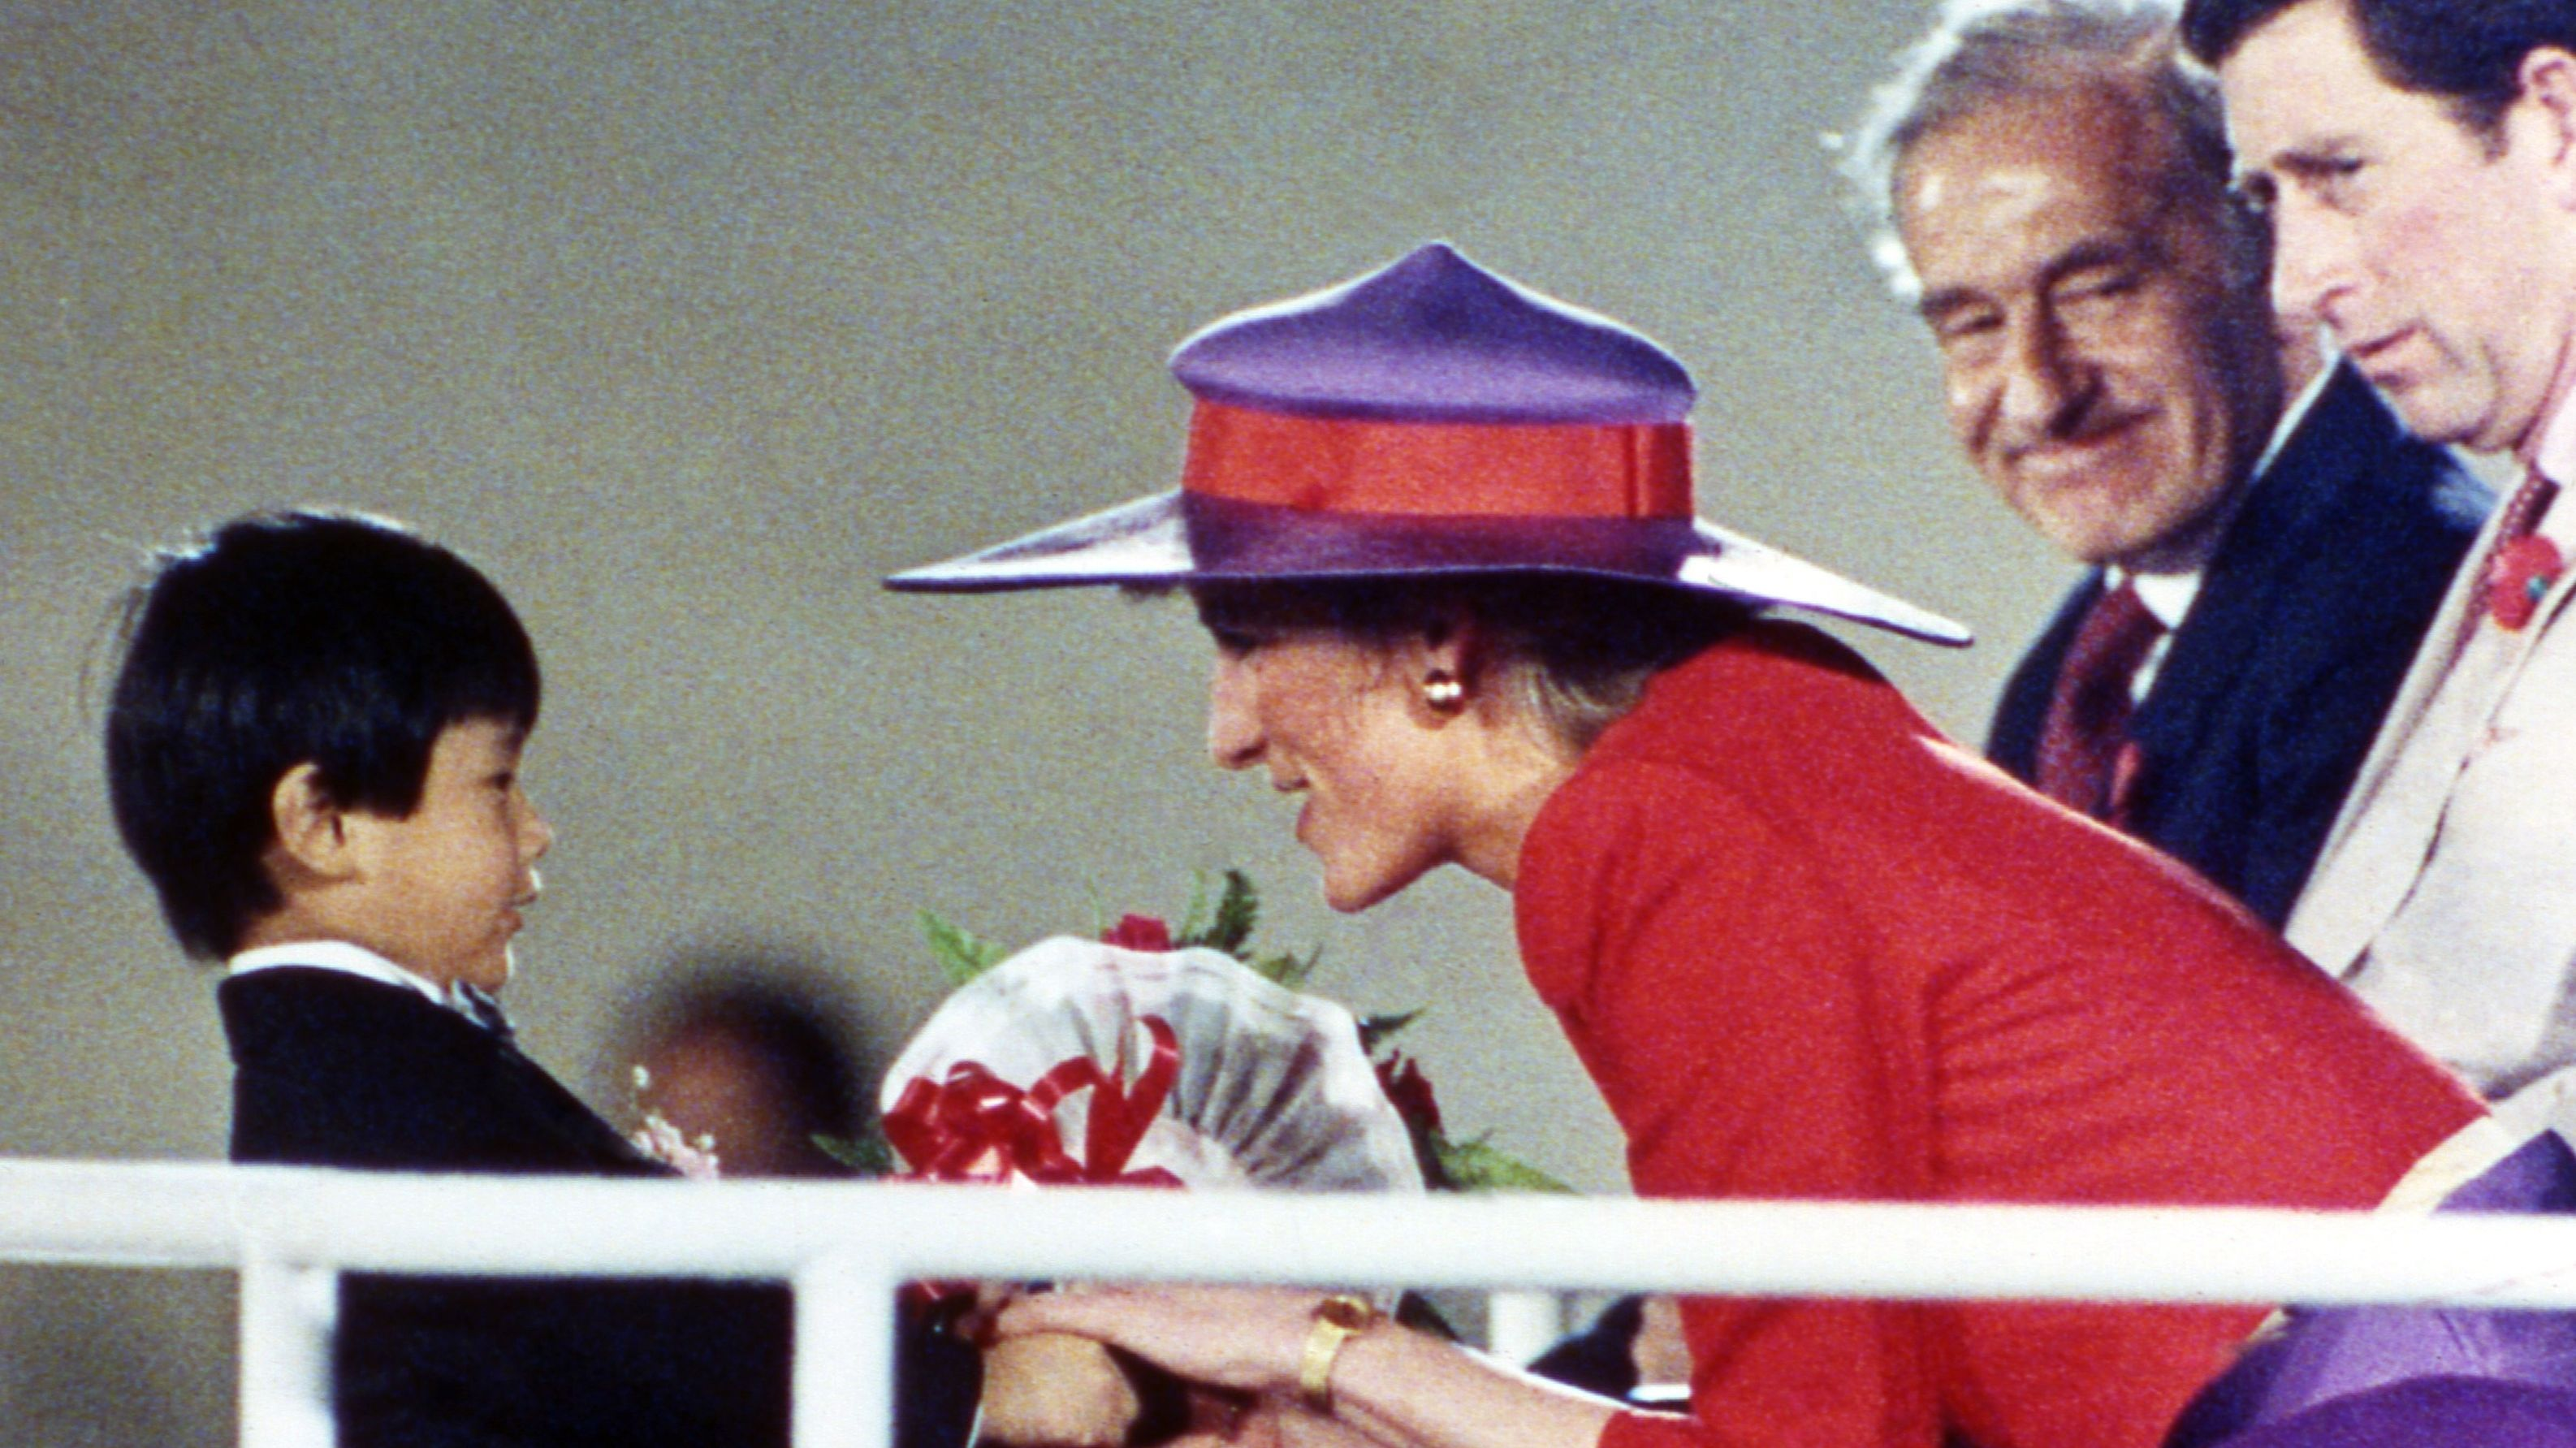 7.11.1989: Lady Dis royale Charmeoffensive in Hongkong